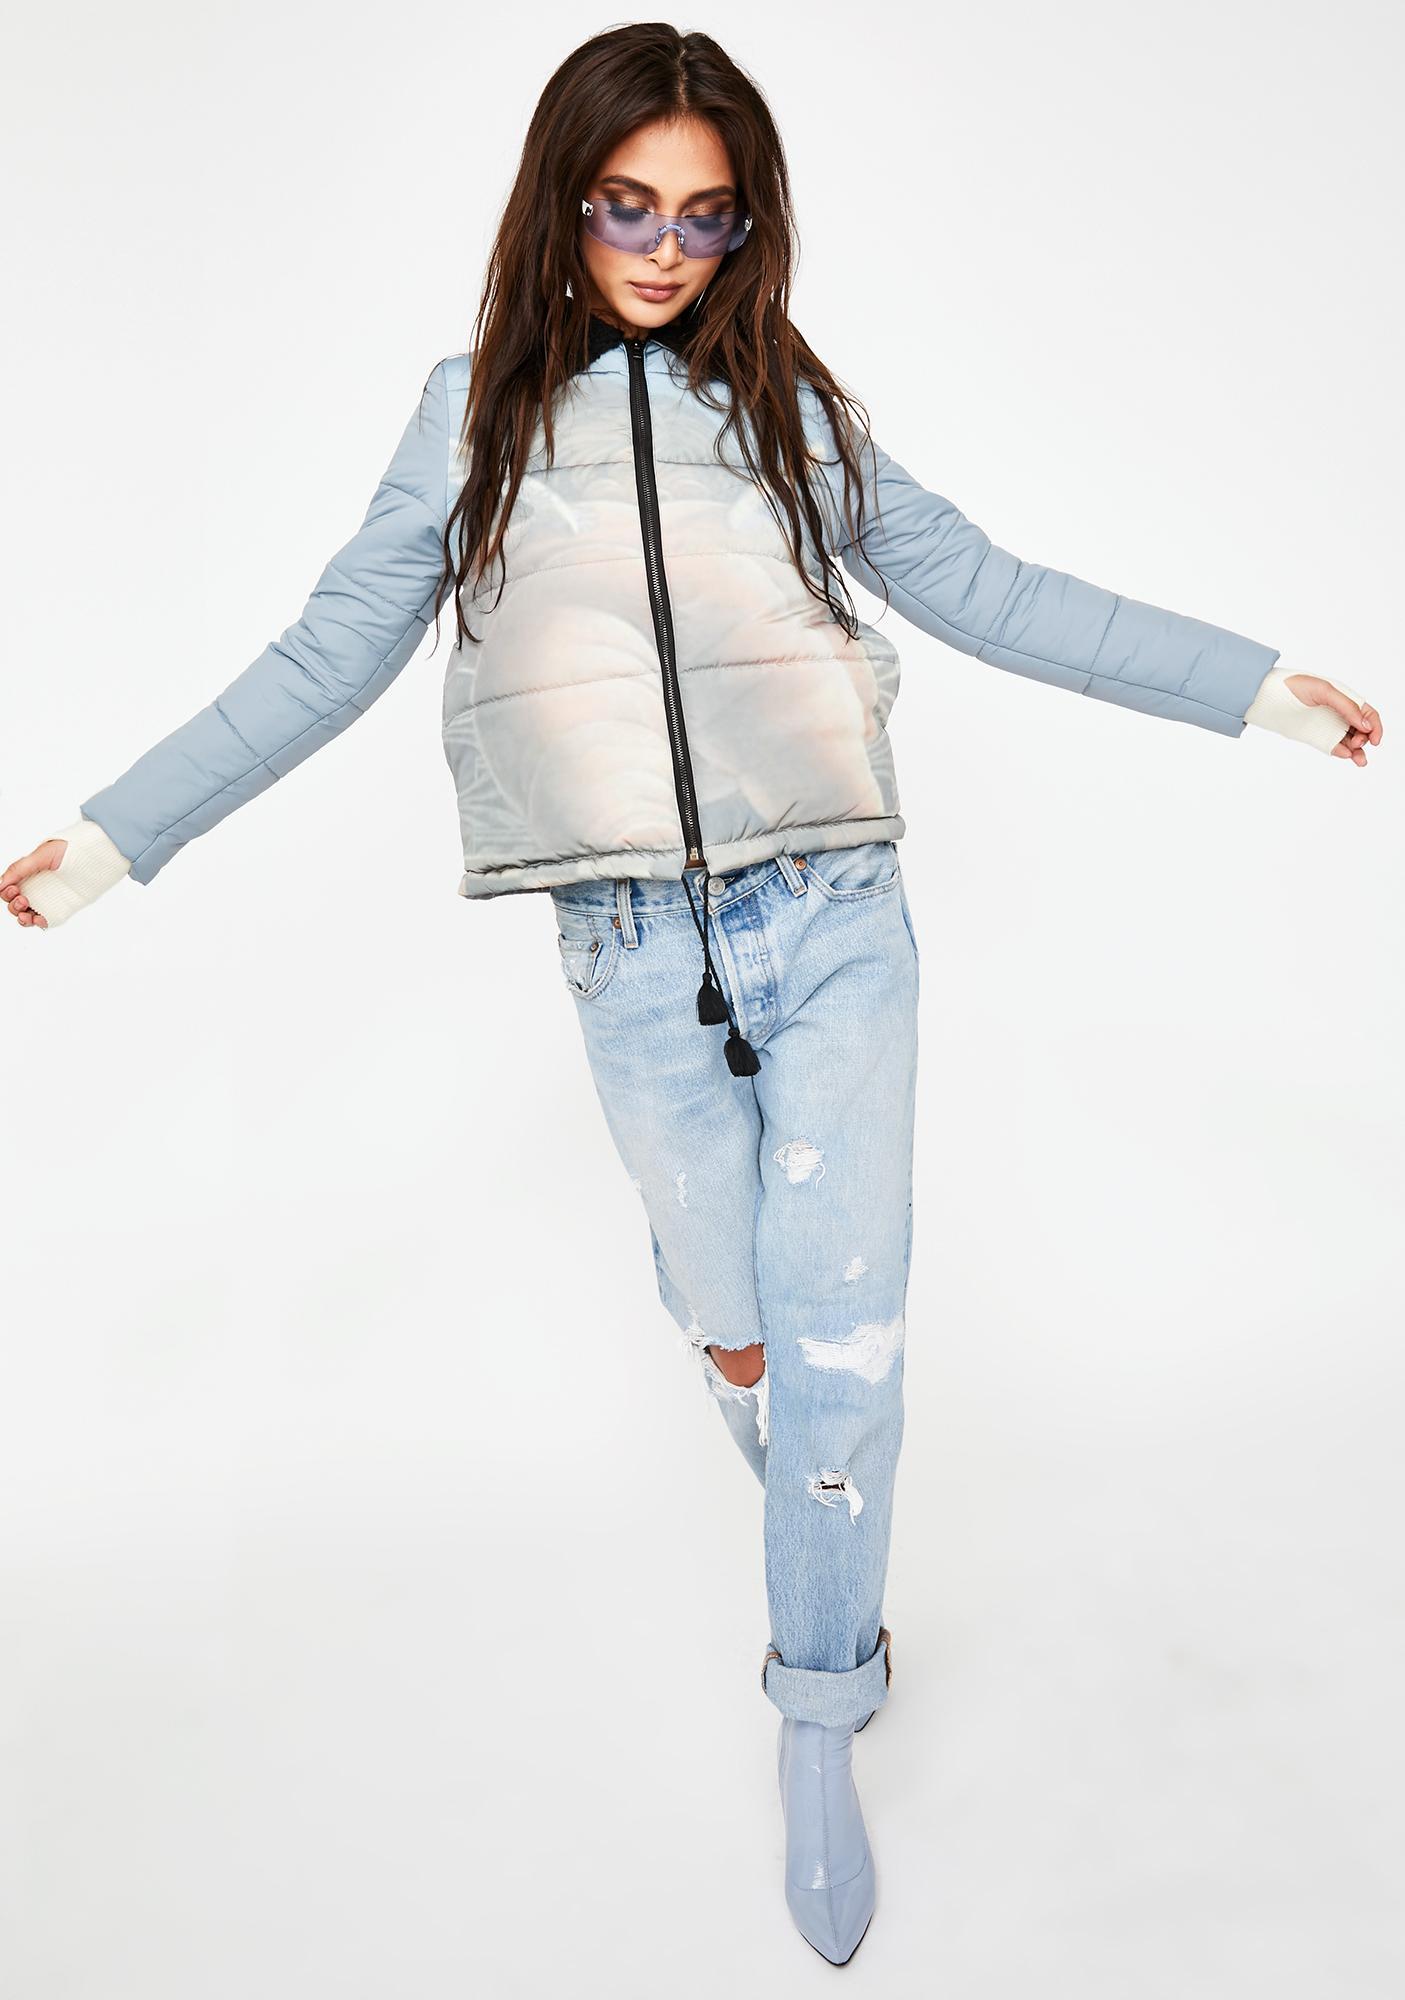 ZEMETA Cupid Bottom Puffer Jacket